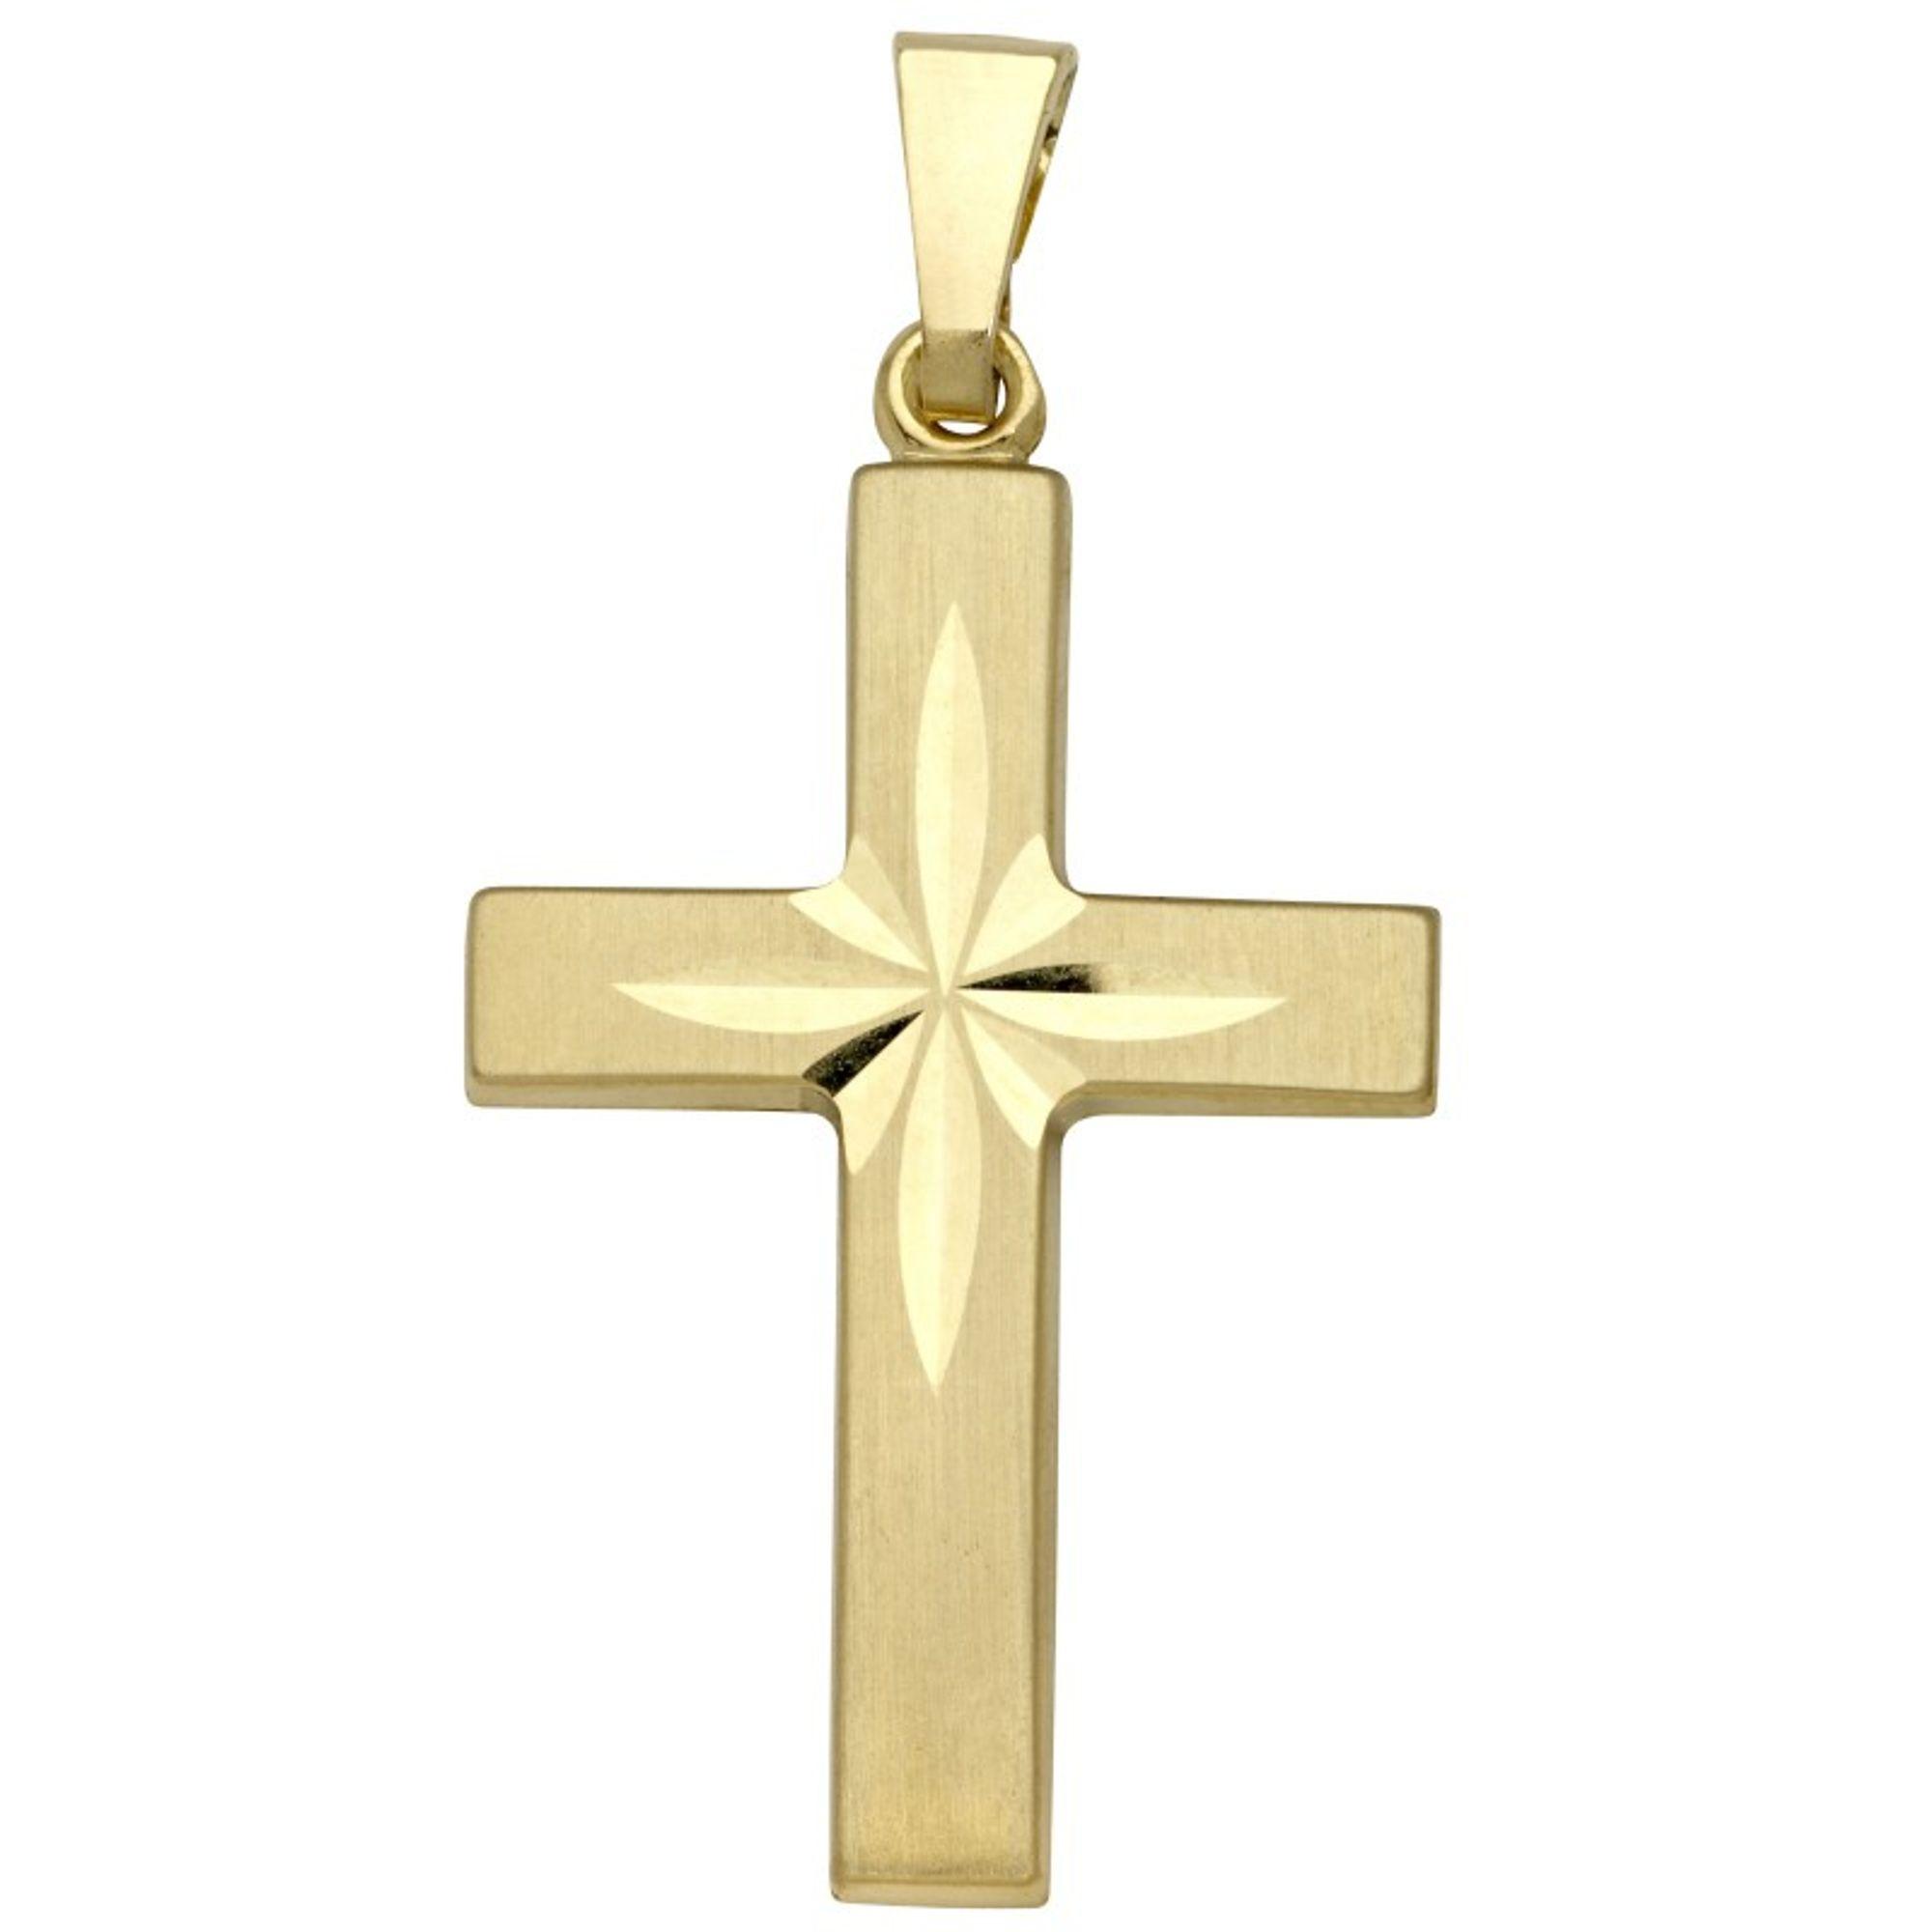 Basic Gold K01 Damen Anhänger Kreuz 14 Karat (585) Gelbgold